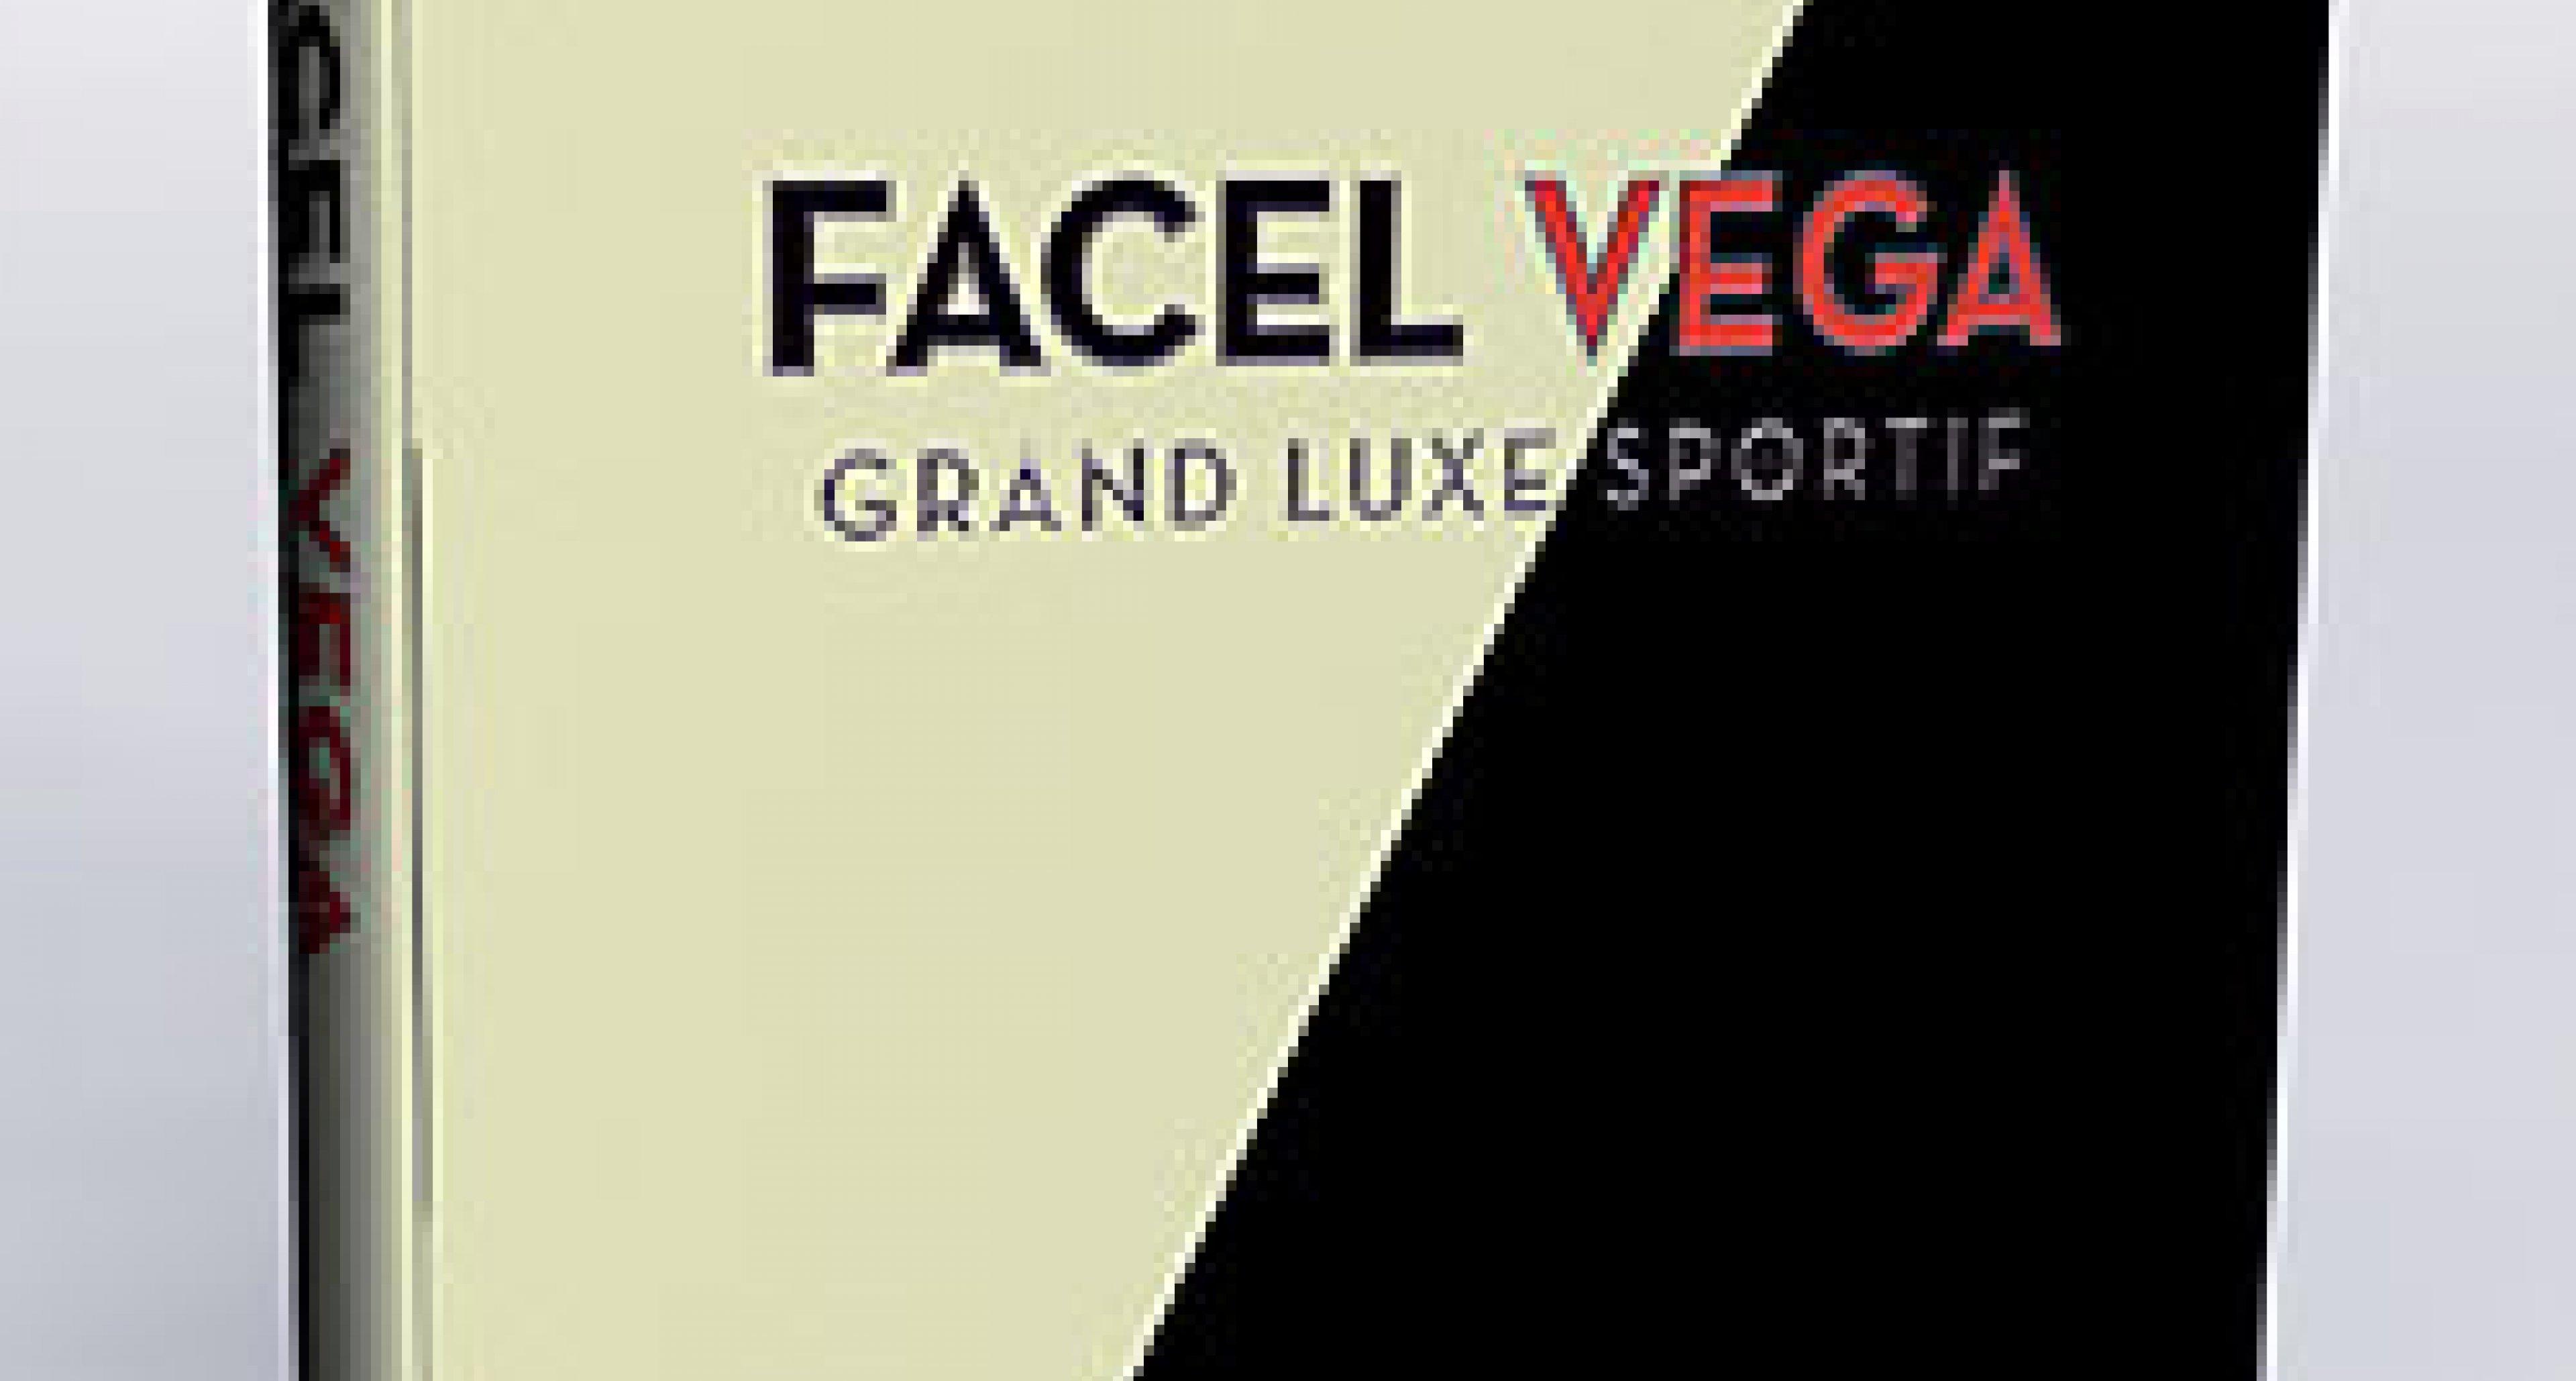 Facel Vega – Grand Luxe Sportif